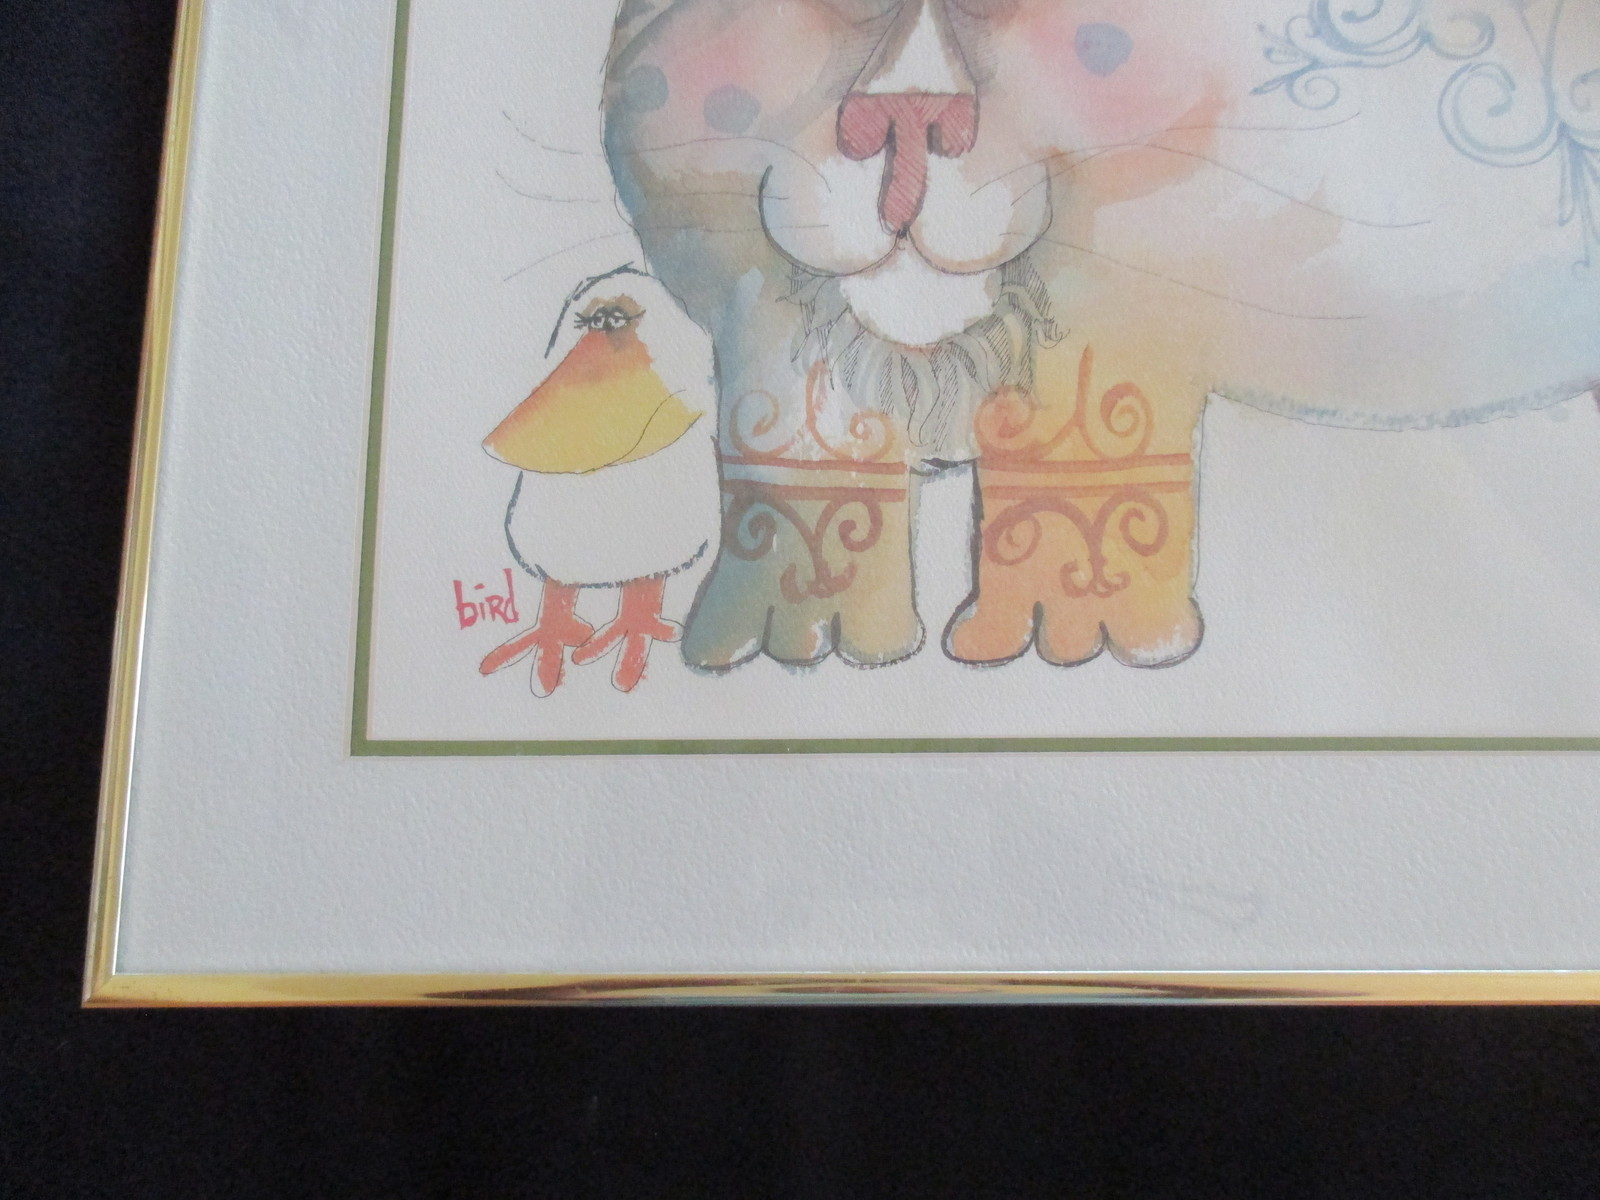 Vintage-NEDOBECK-Signed-Print-16-X-20-Framed-Cat-Bird-Another Bird